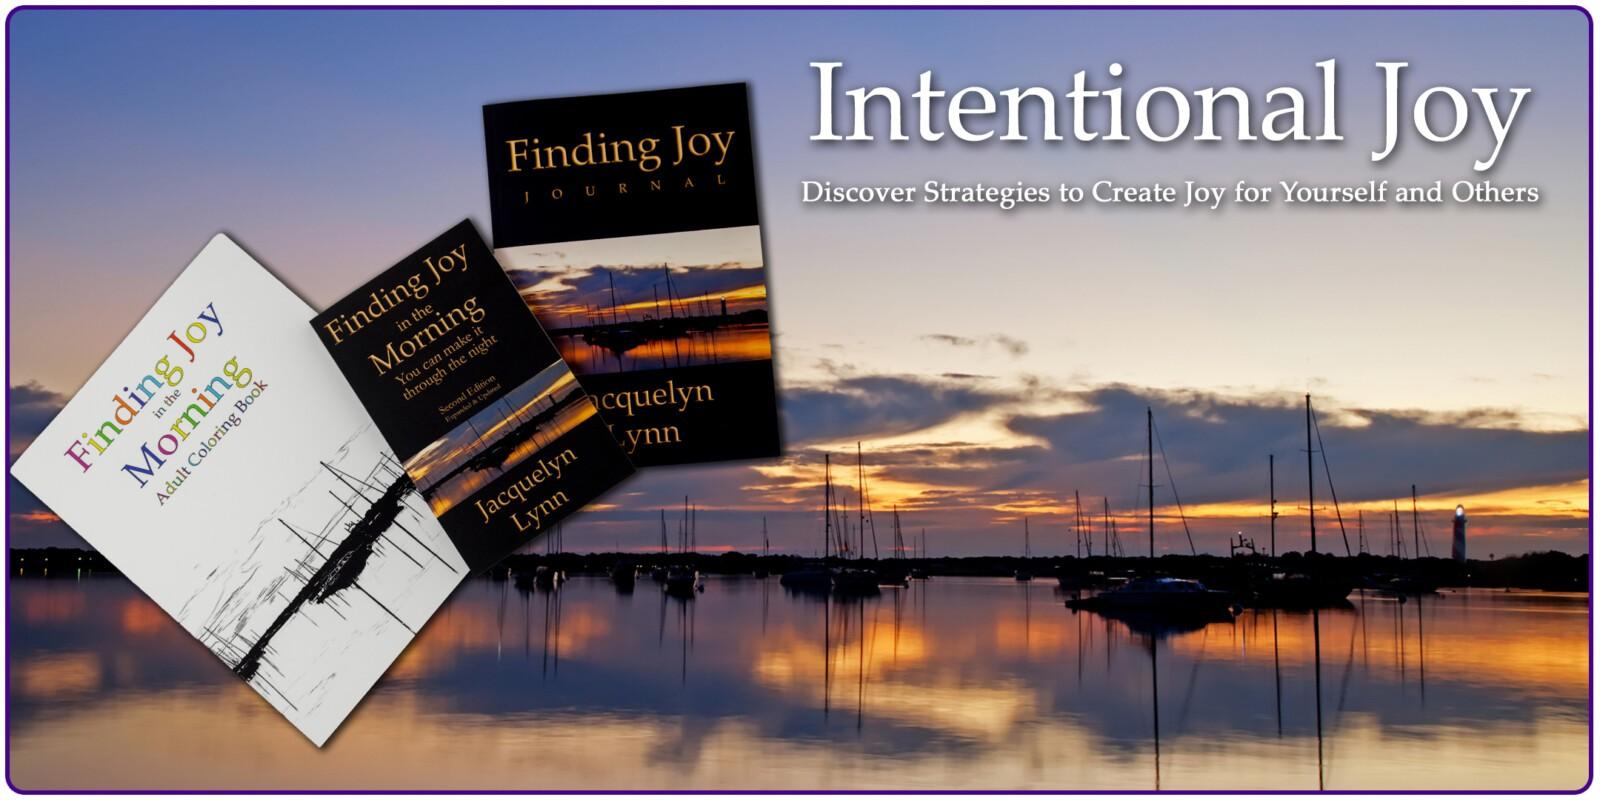 Intentional Joy Workshop